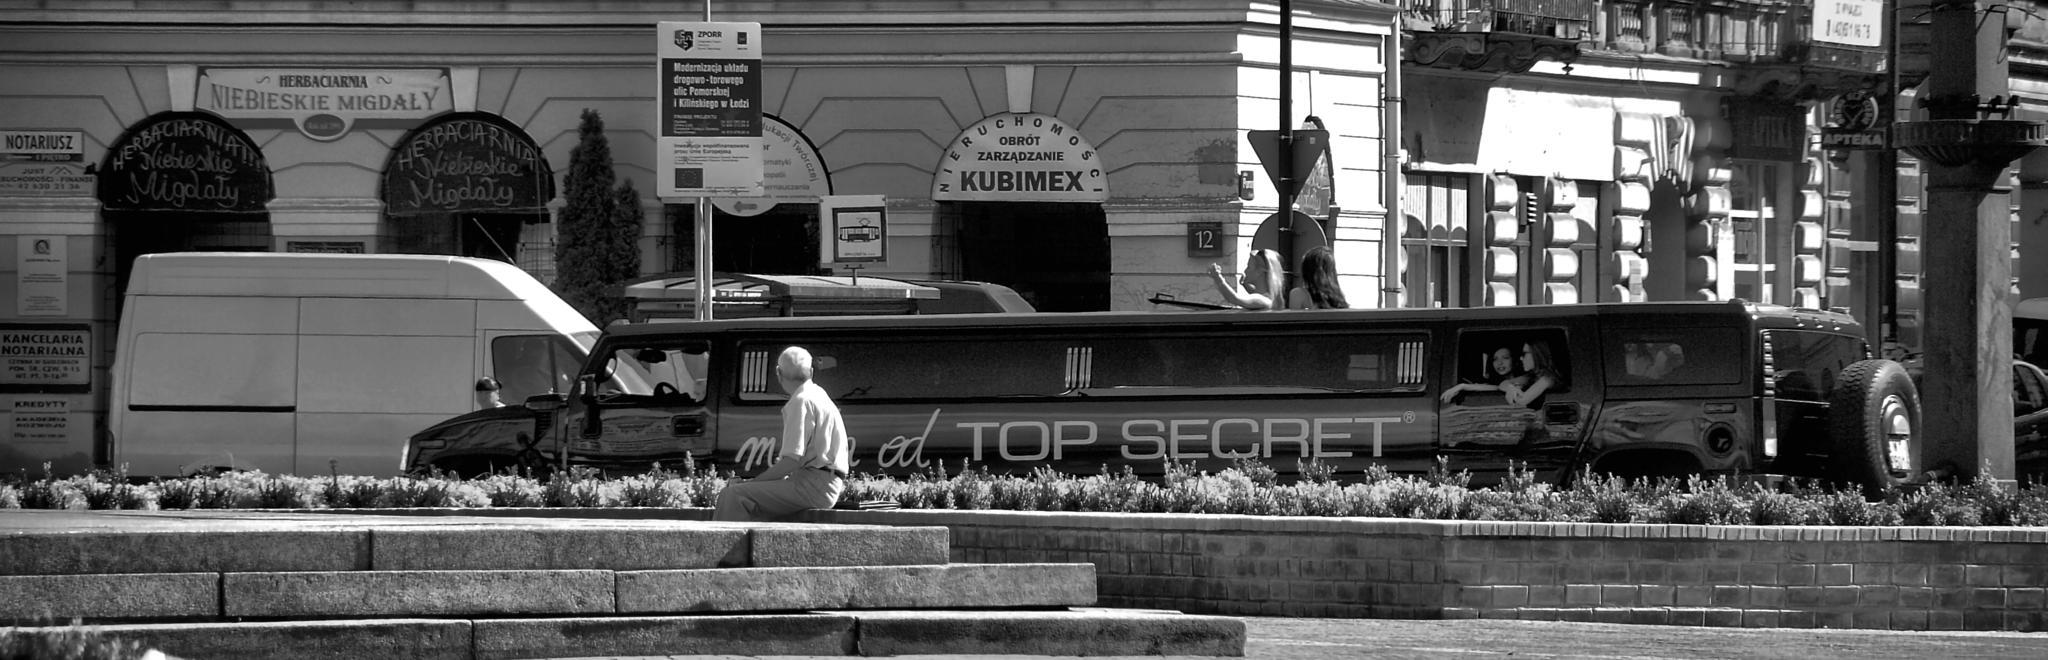 Top secret by piotr.b.tubylec